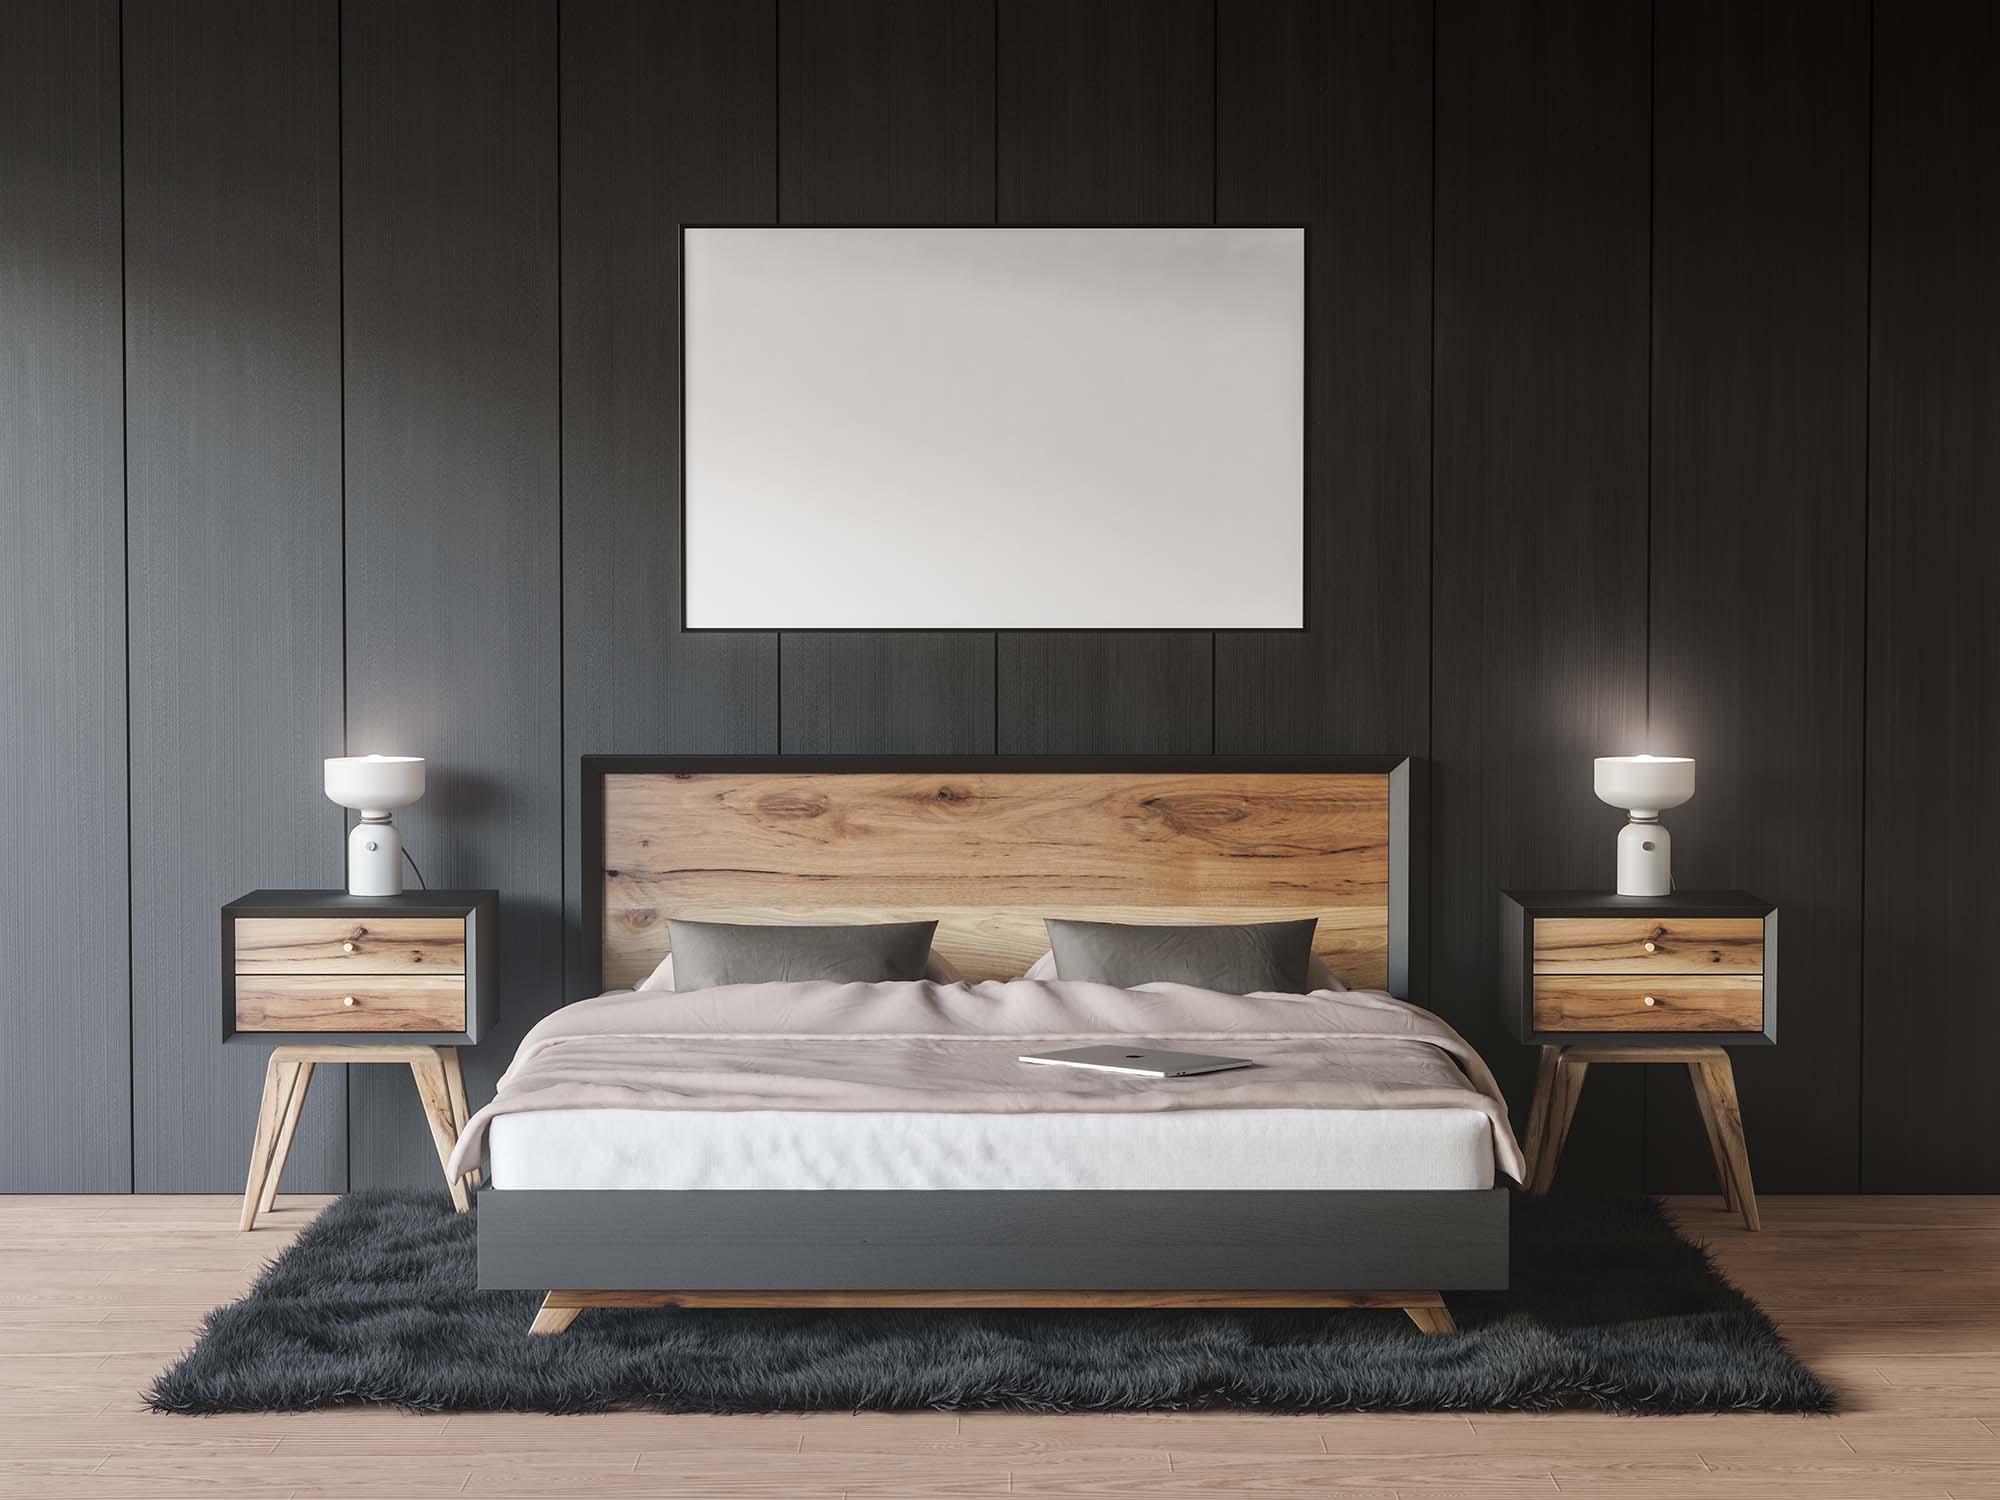 Bedroom Poster Mockup 2